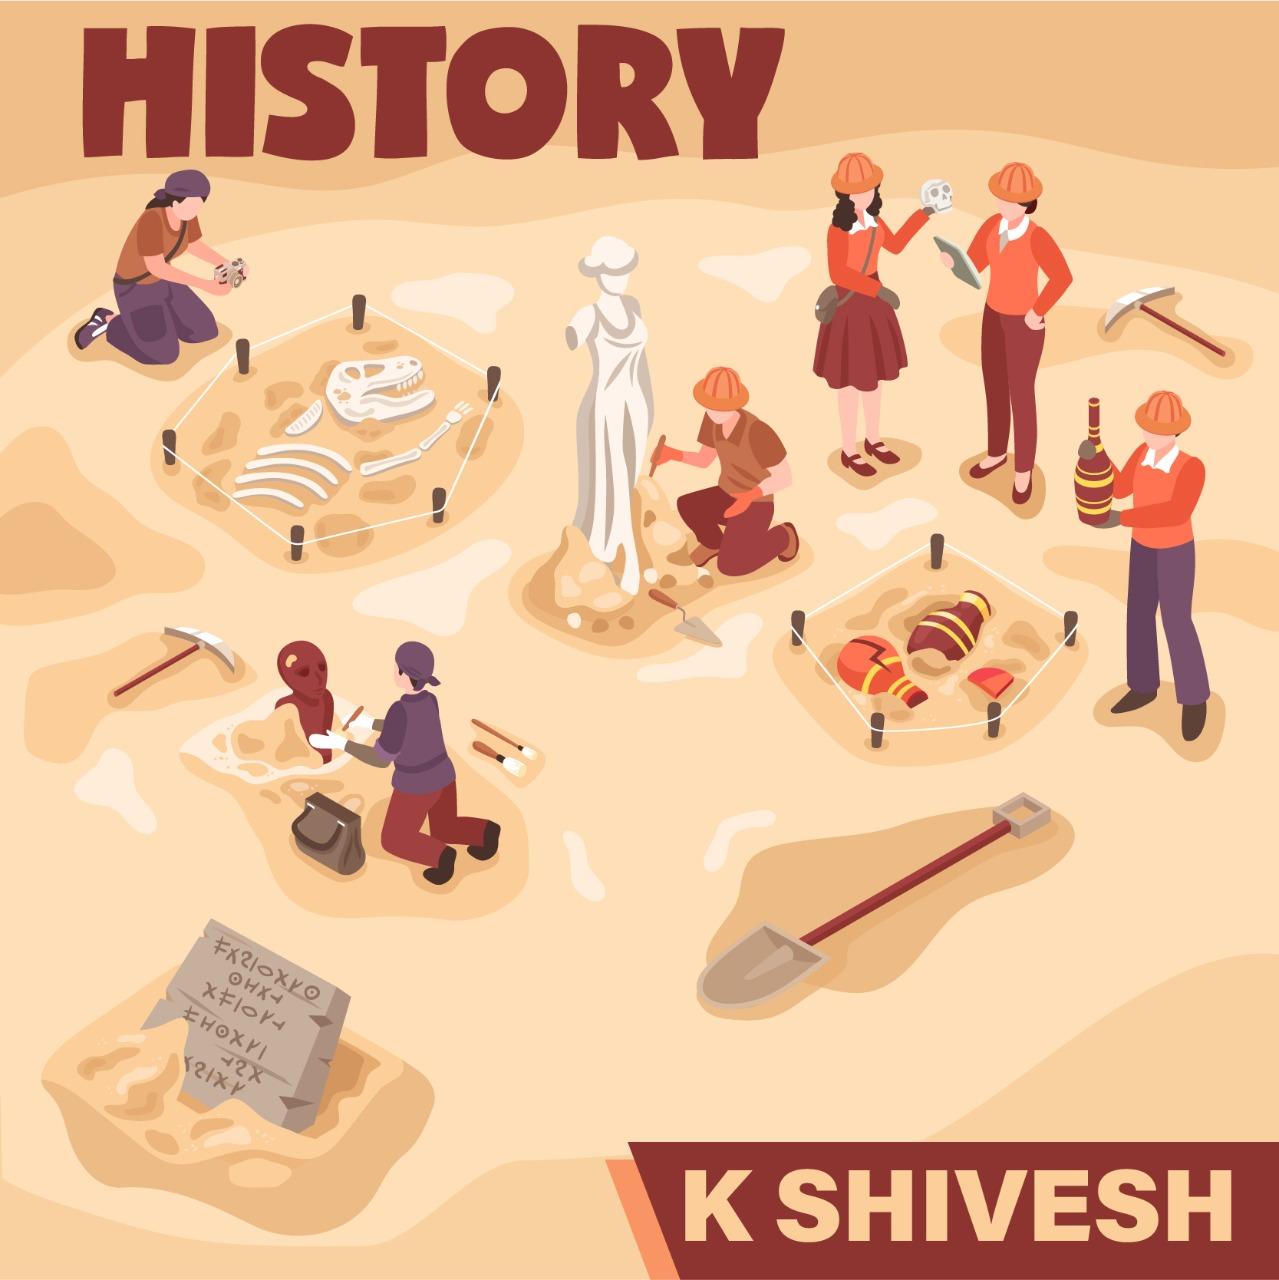 K Shivesh - INDIAN HISTORY